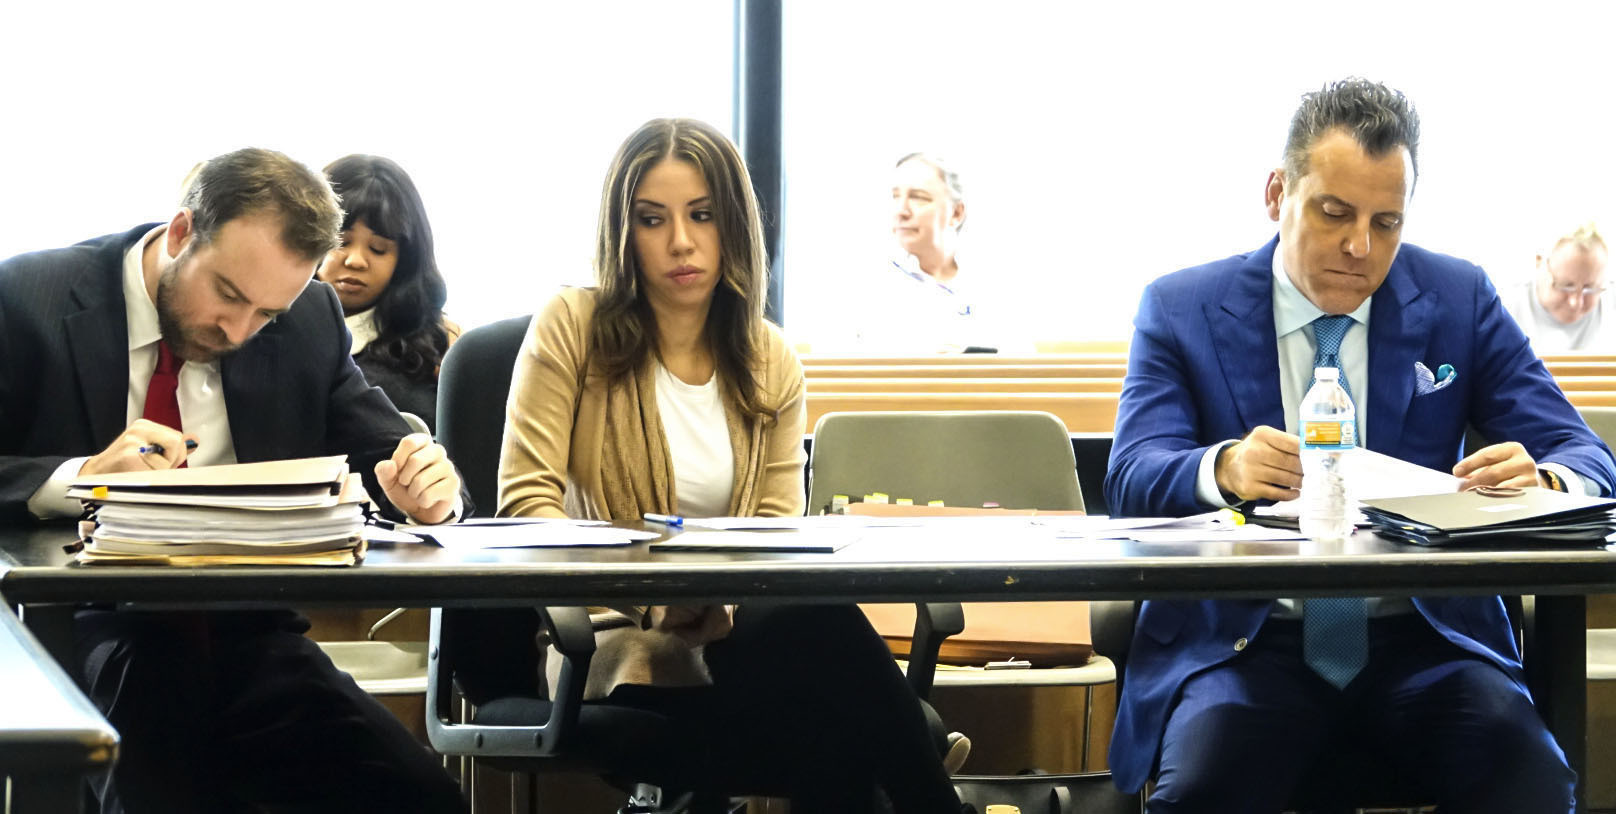 Jury Hears Police Recordings In Dalia Dippolitos Second Trial On